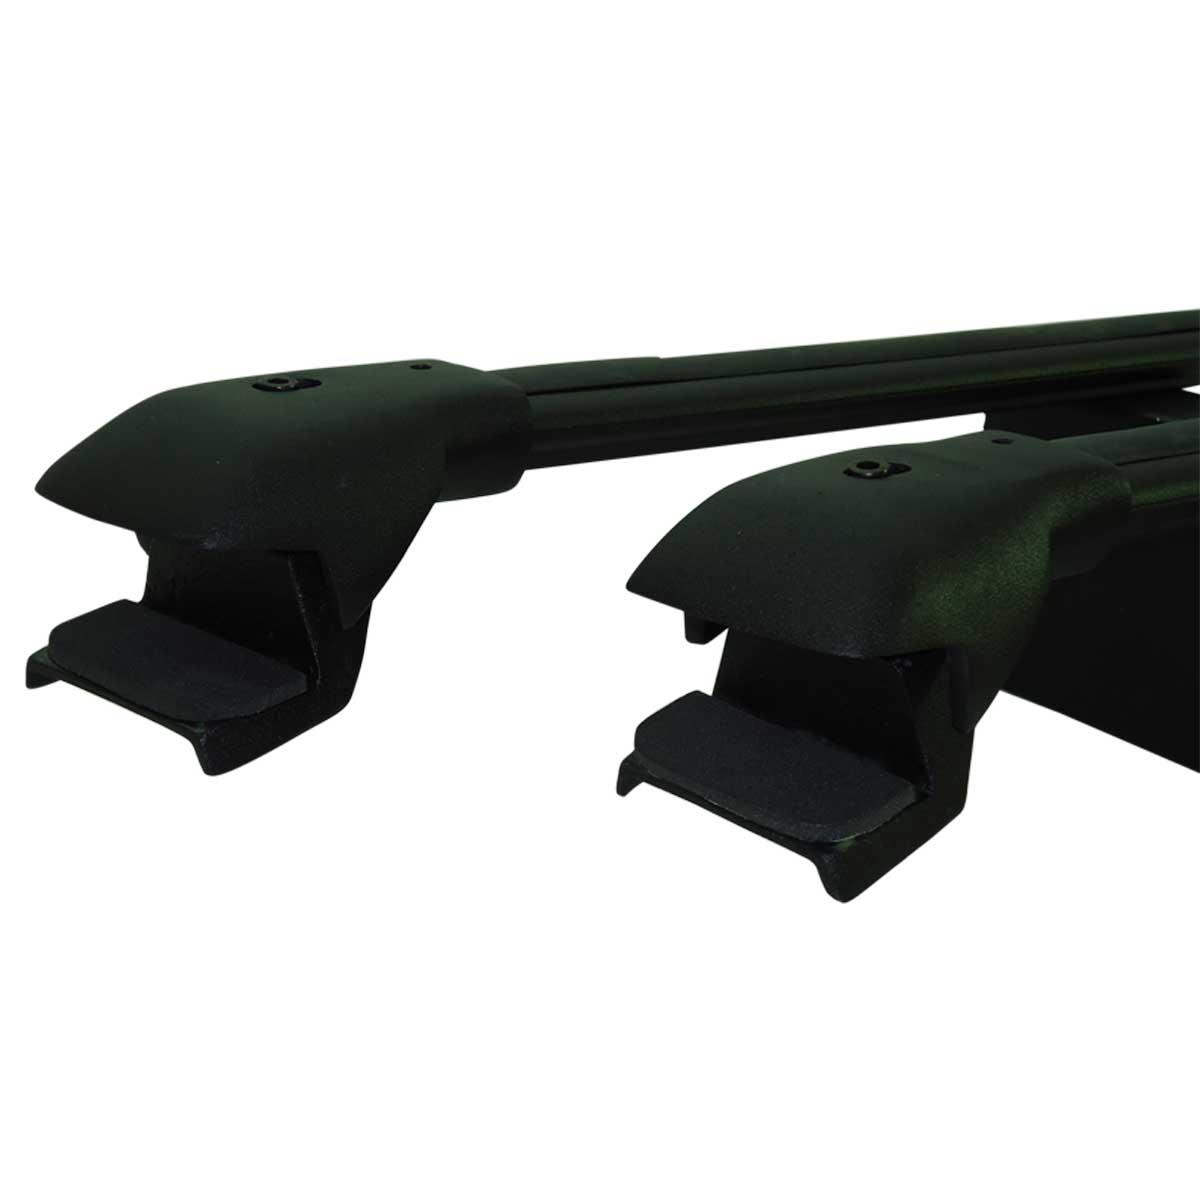 Travessa rack de teto larga preta alumínio Palio Weekend Adventure 2009 a 2012 ou Weekend Adventure 2013 a 2017